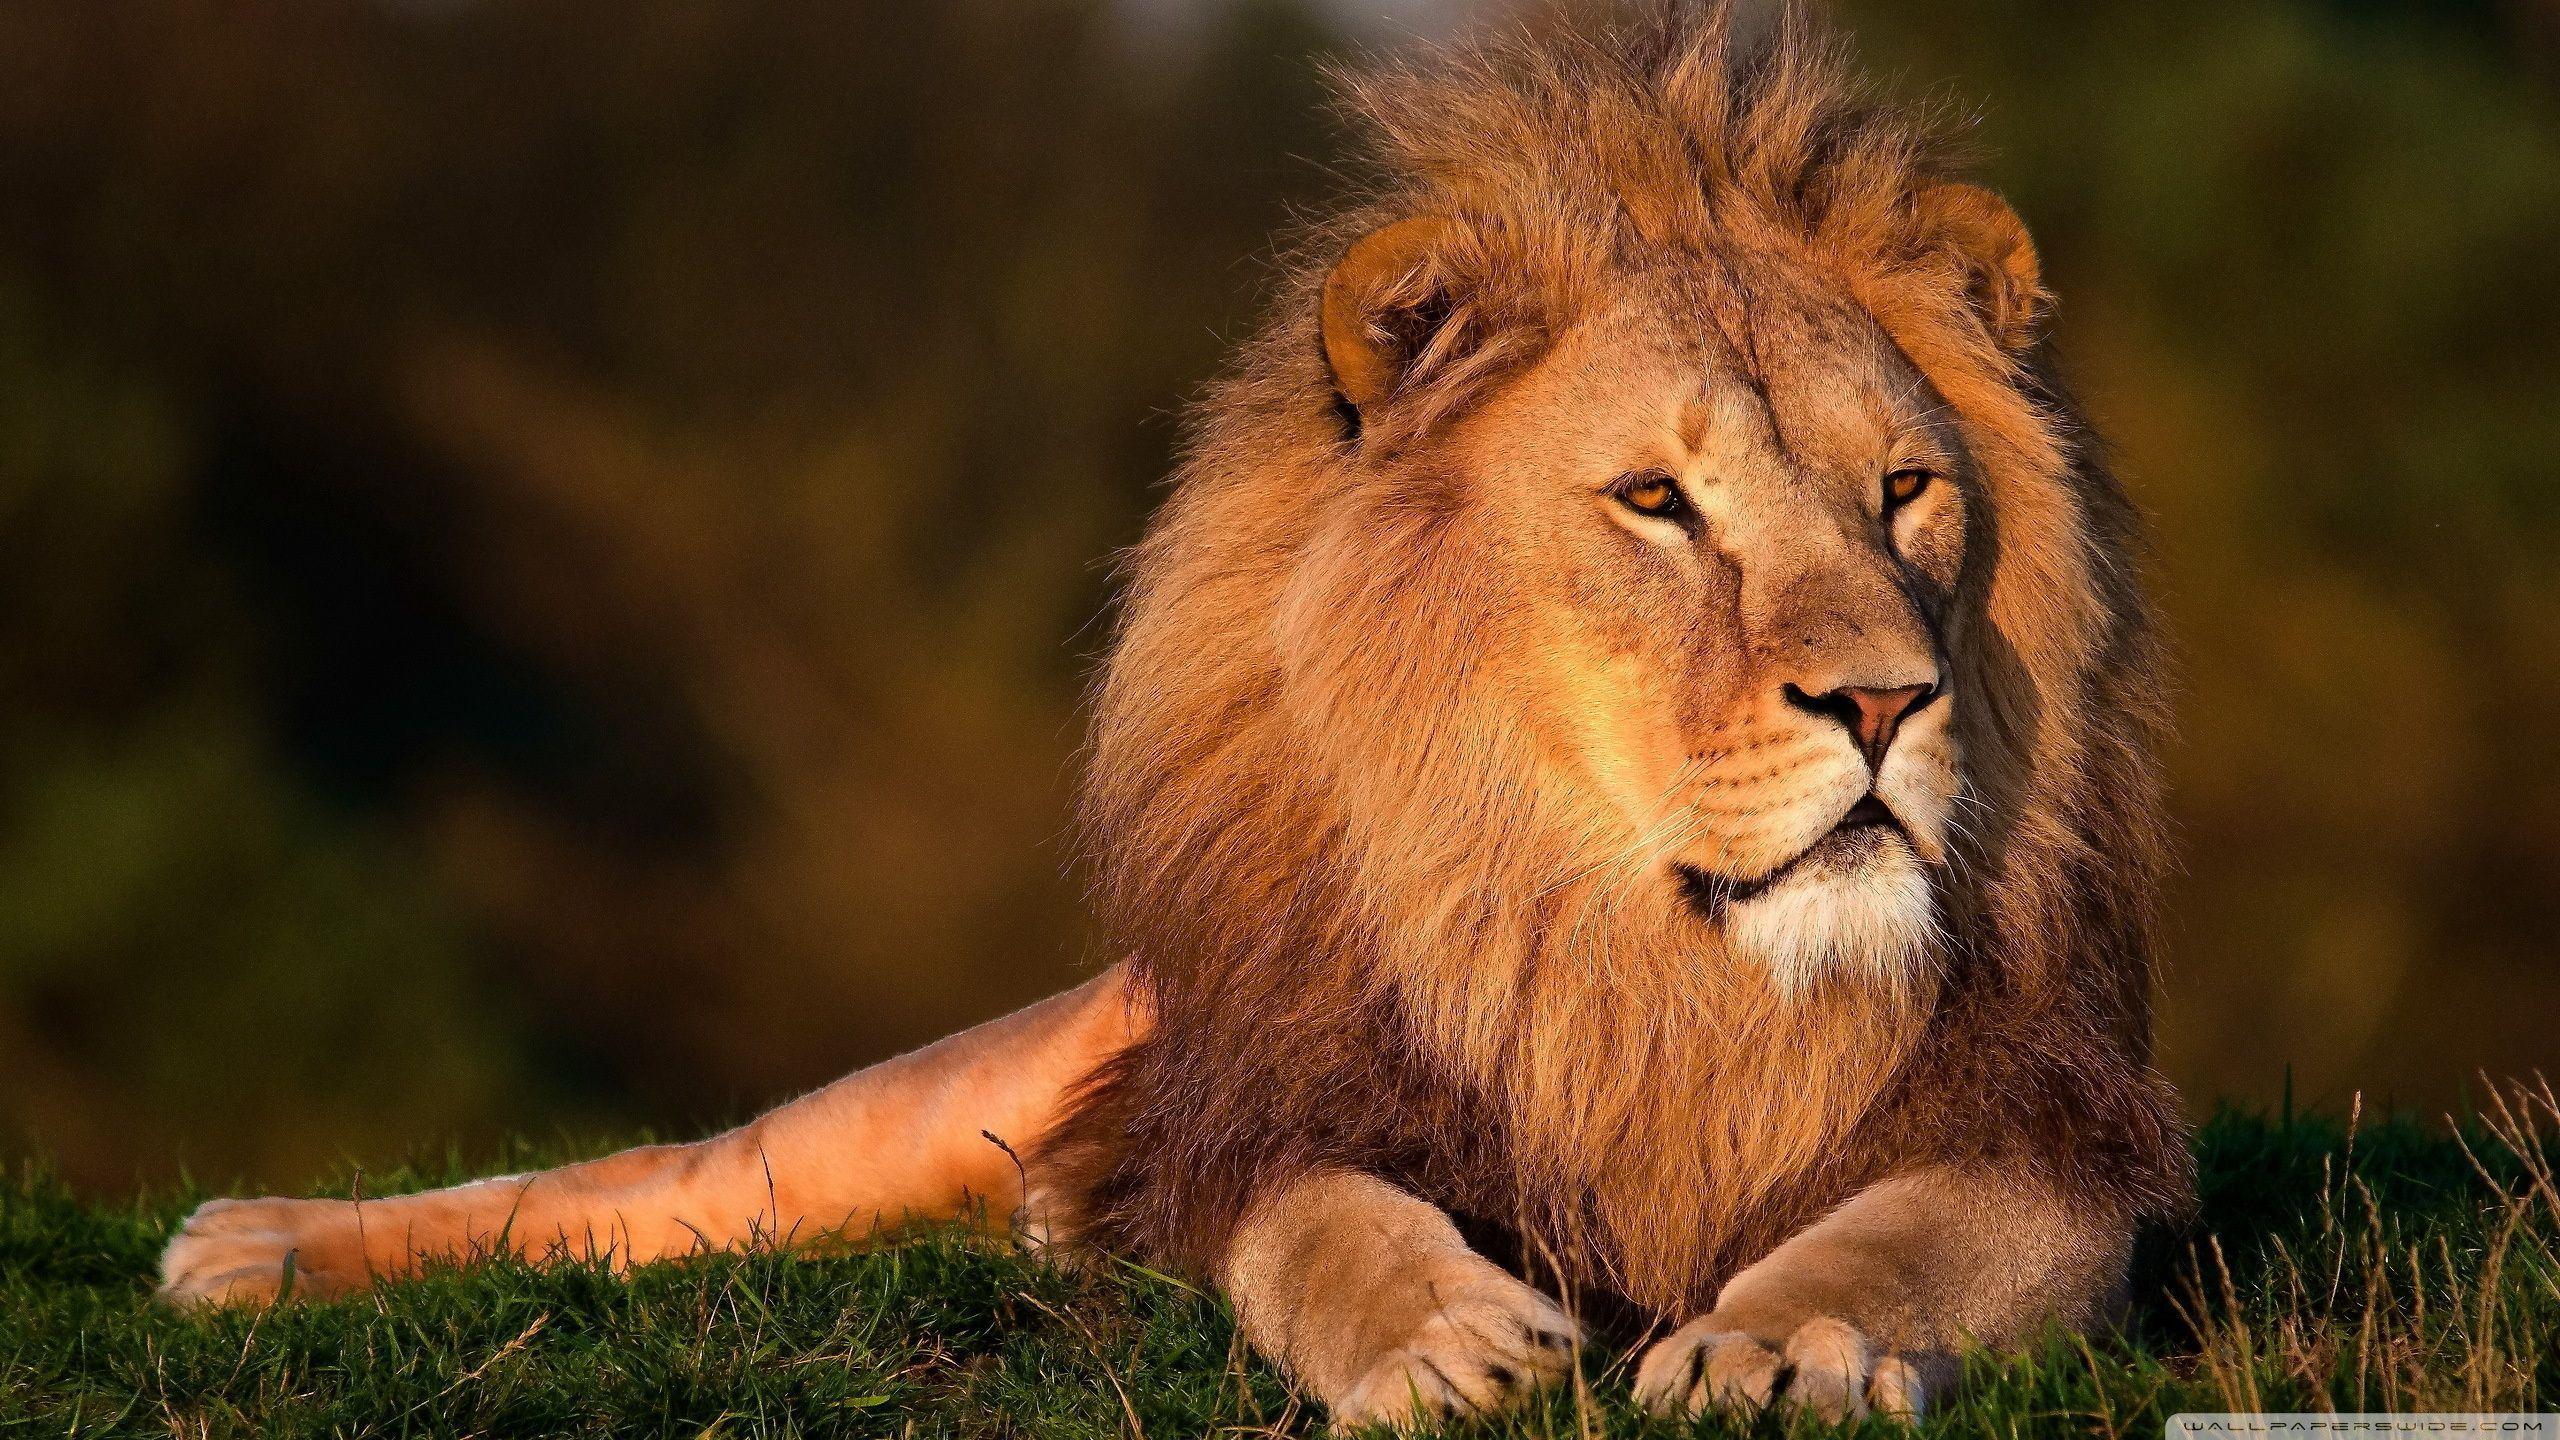 Lion HD desktop wallpaper : High Definition : Fullscreen : Mobile ...